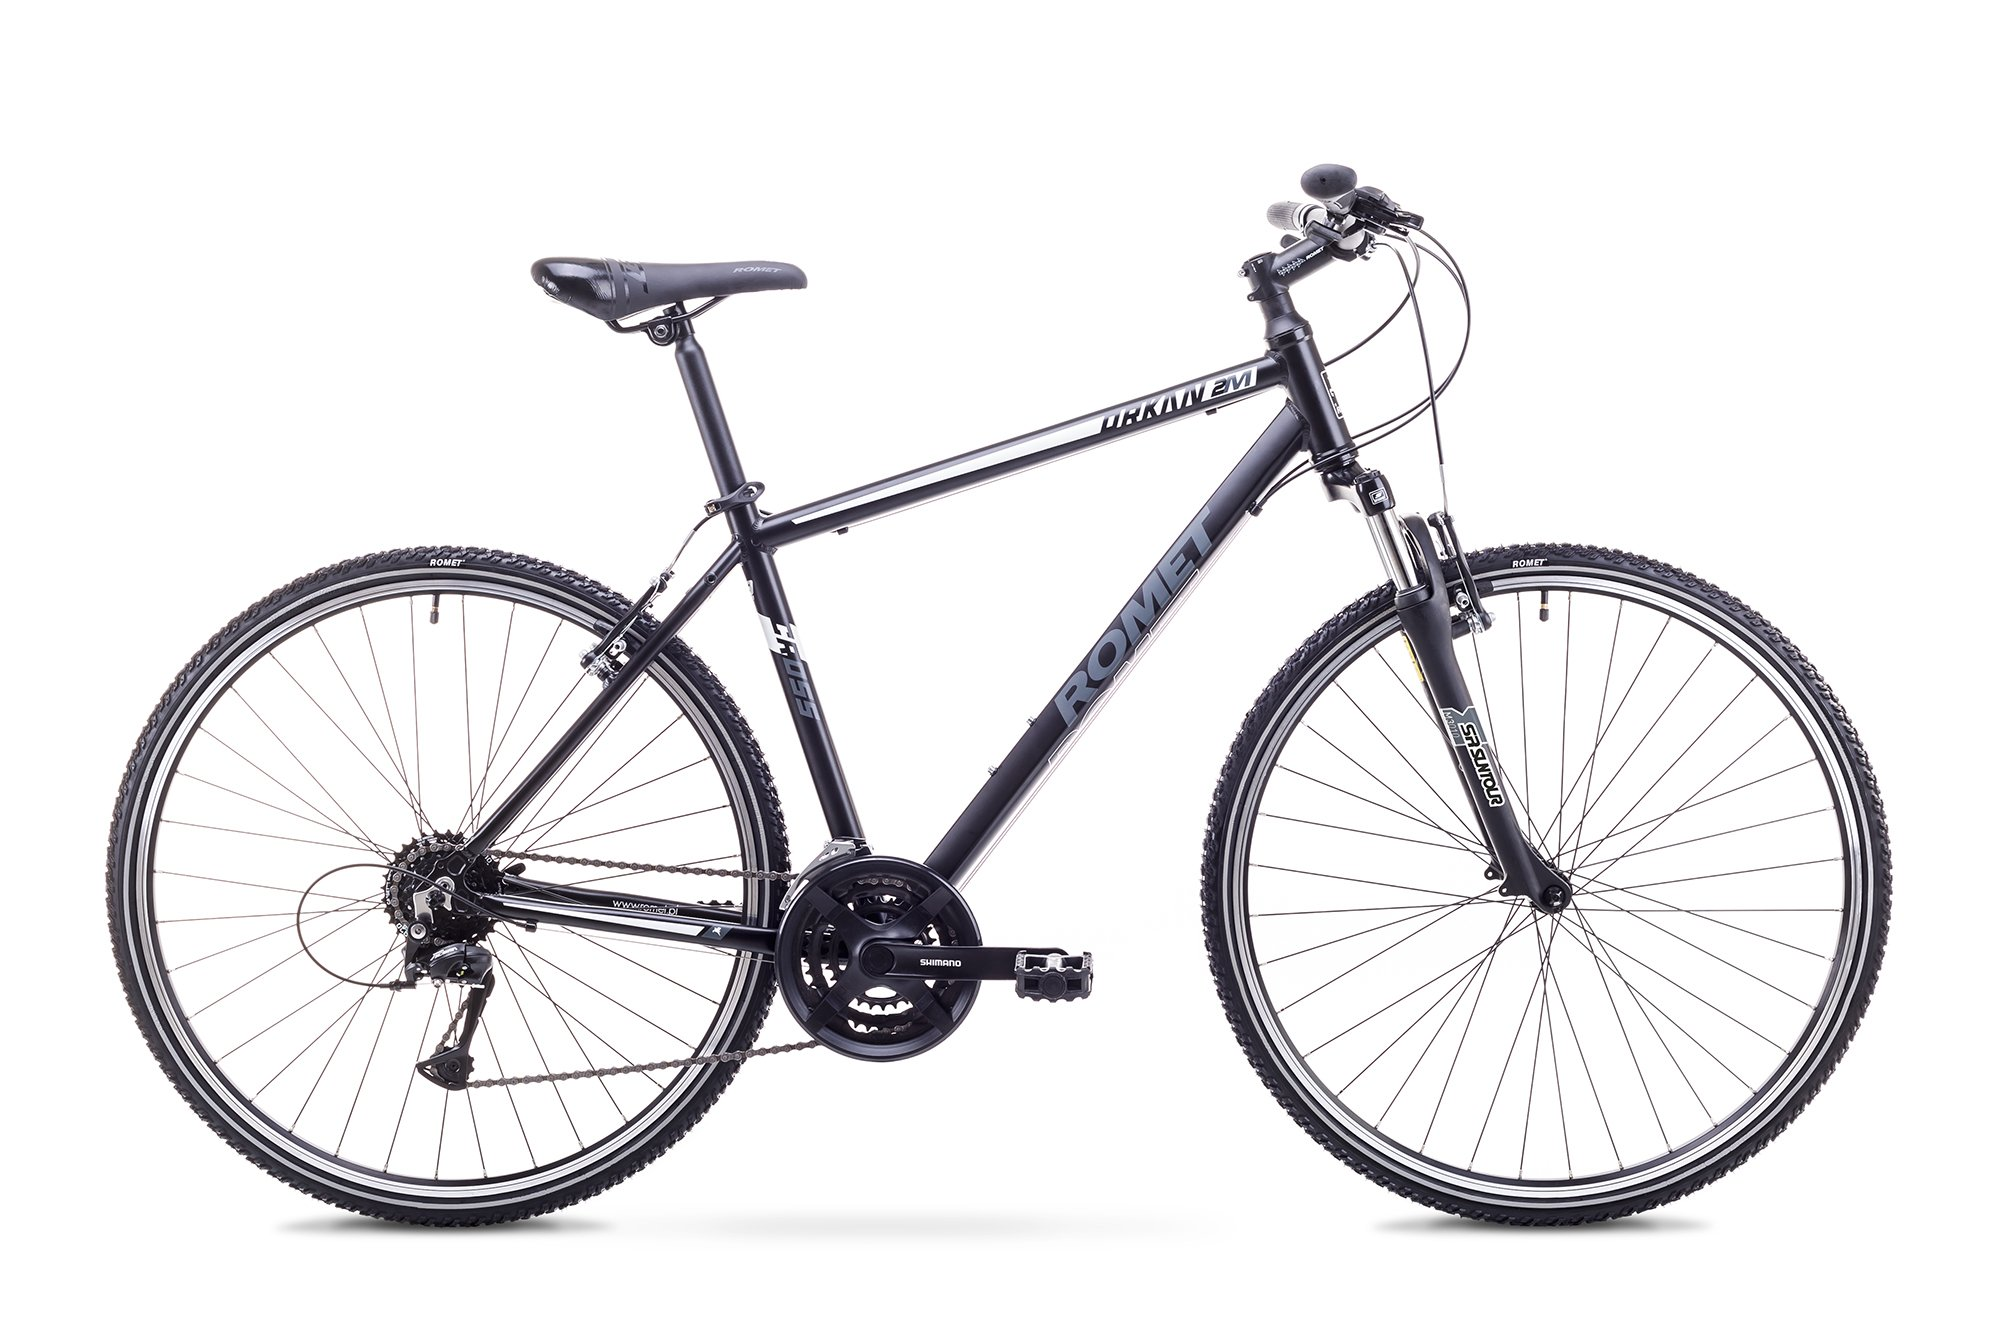 Romet Orkan 2 herre, 24speed, Acera-mix, Sort/Grå | City-cykler